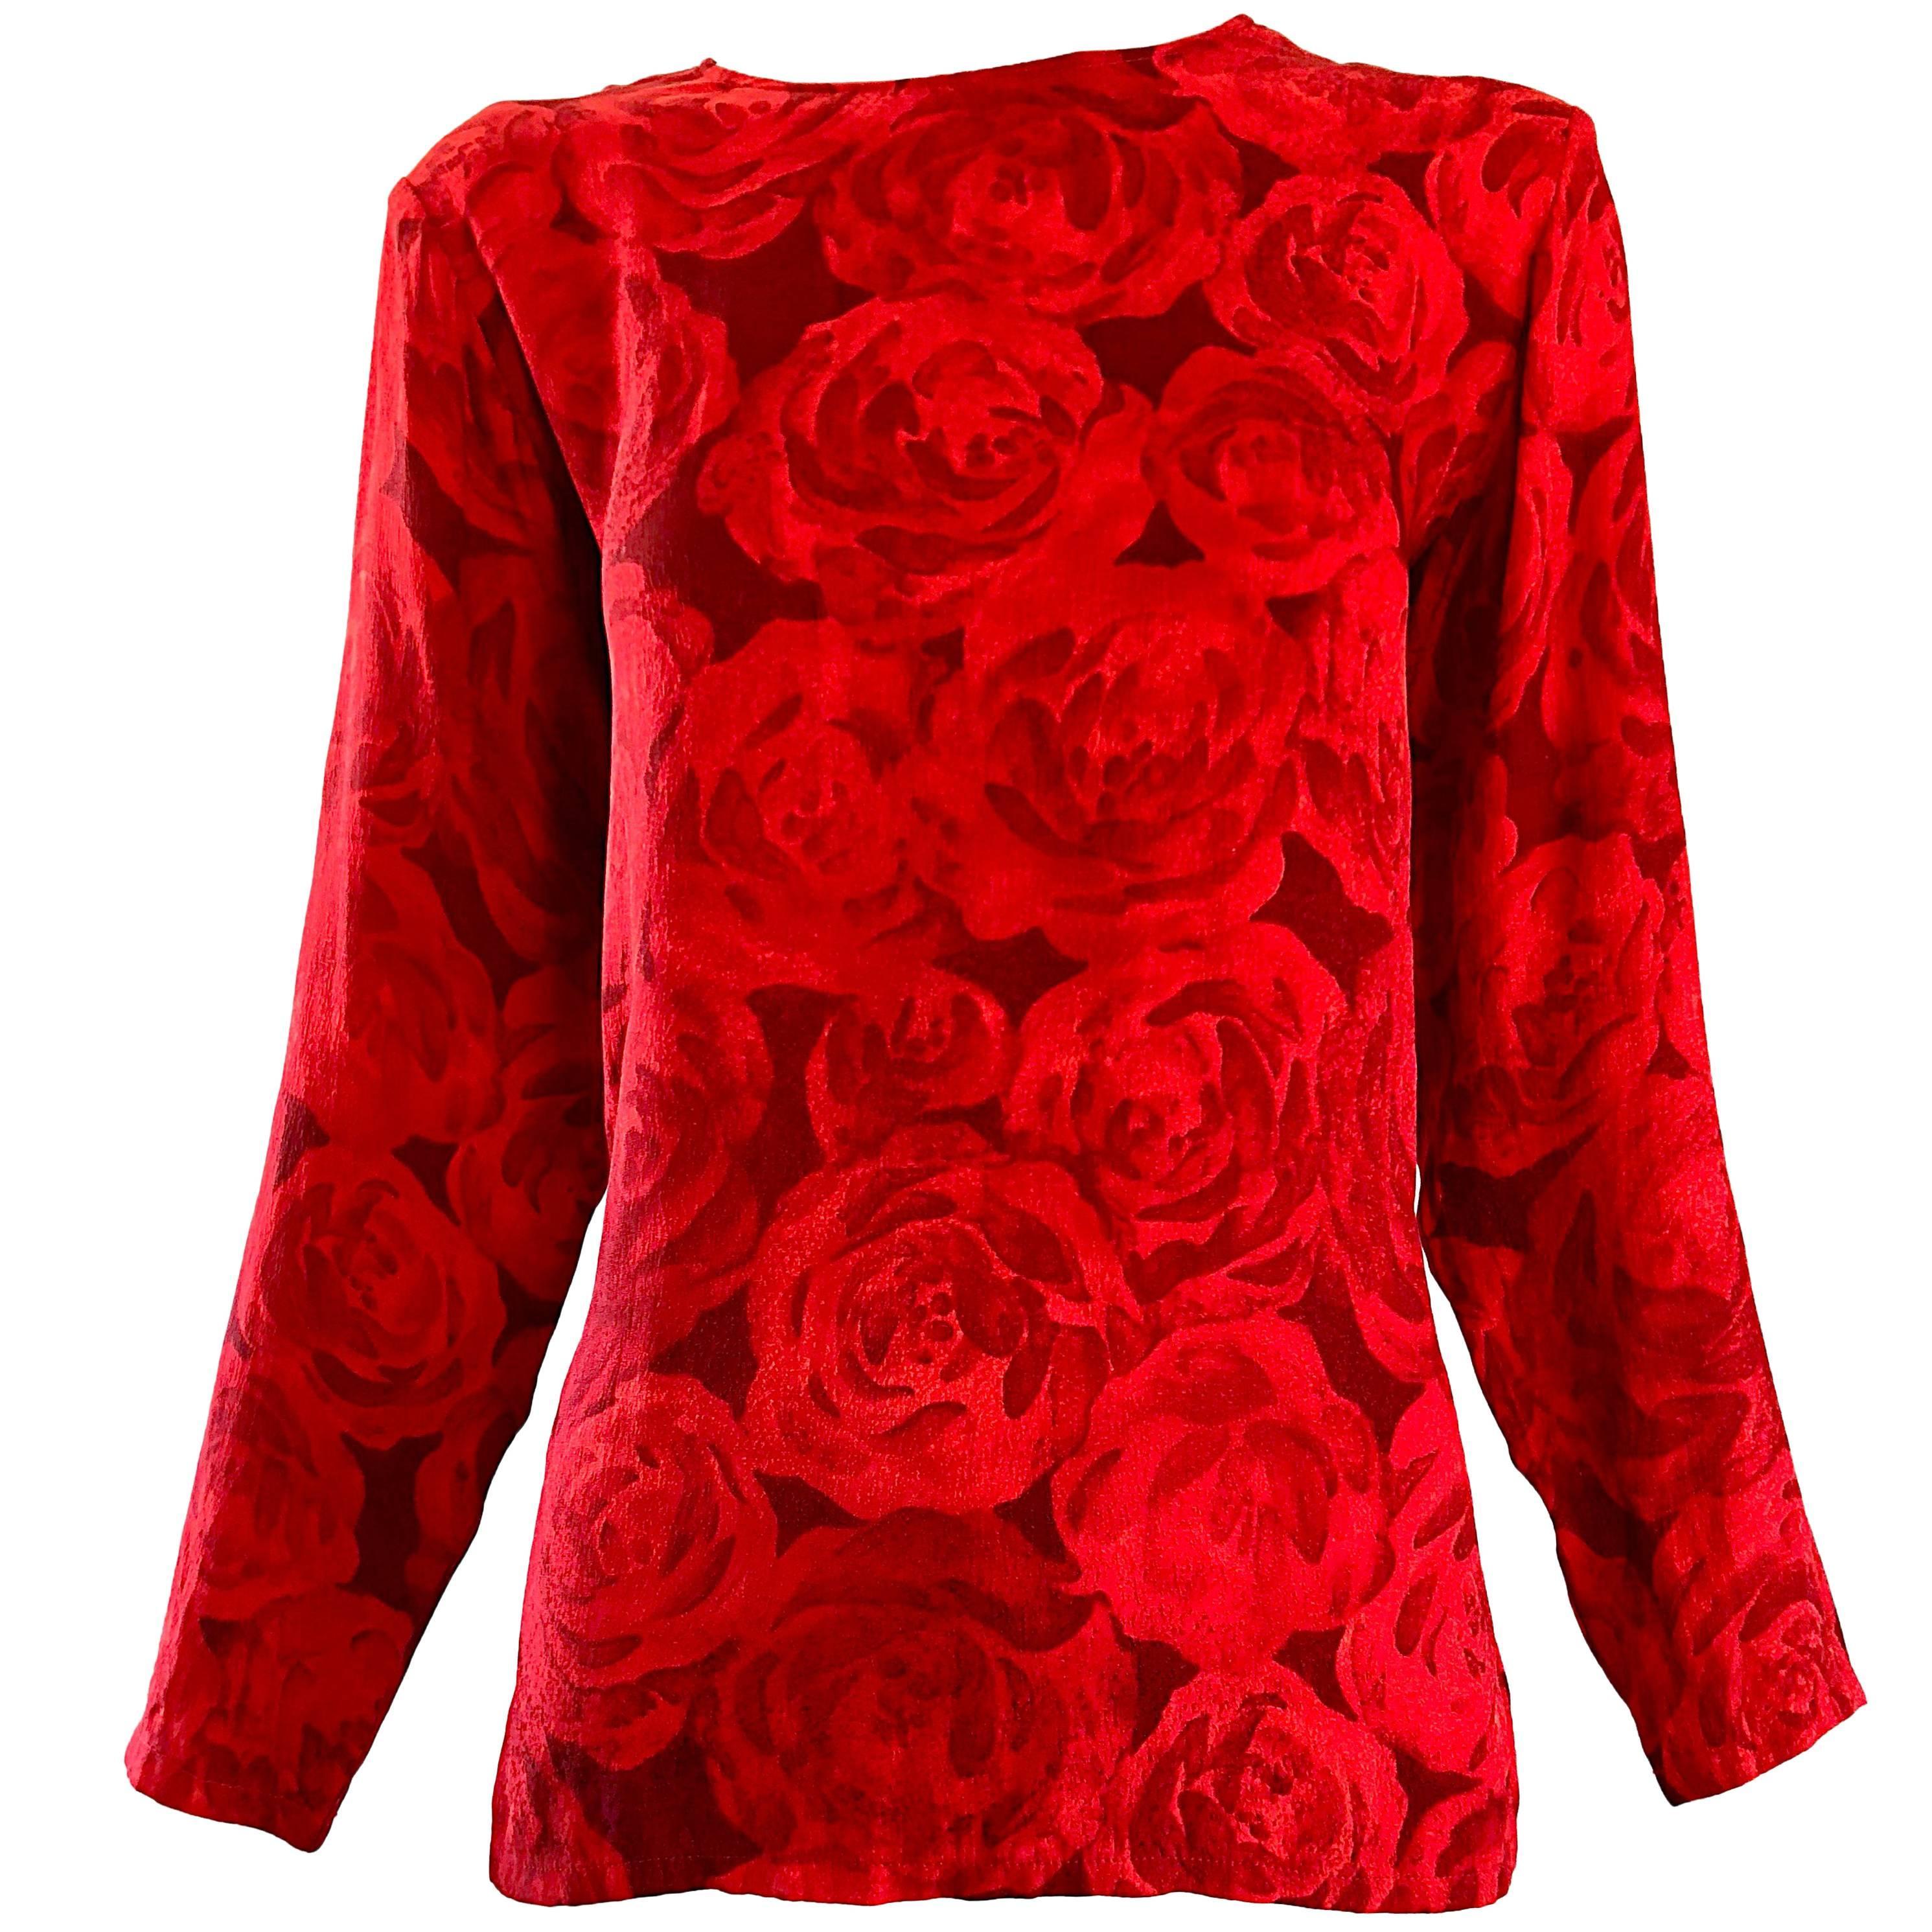 1990s Yves Saint Laurent Rive Gauche Rose Print Red Silk Vintage 90s Blouse Top